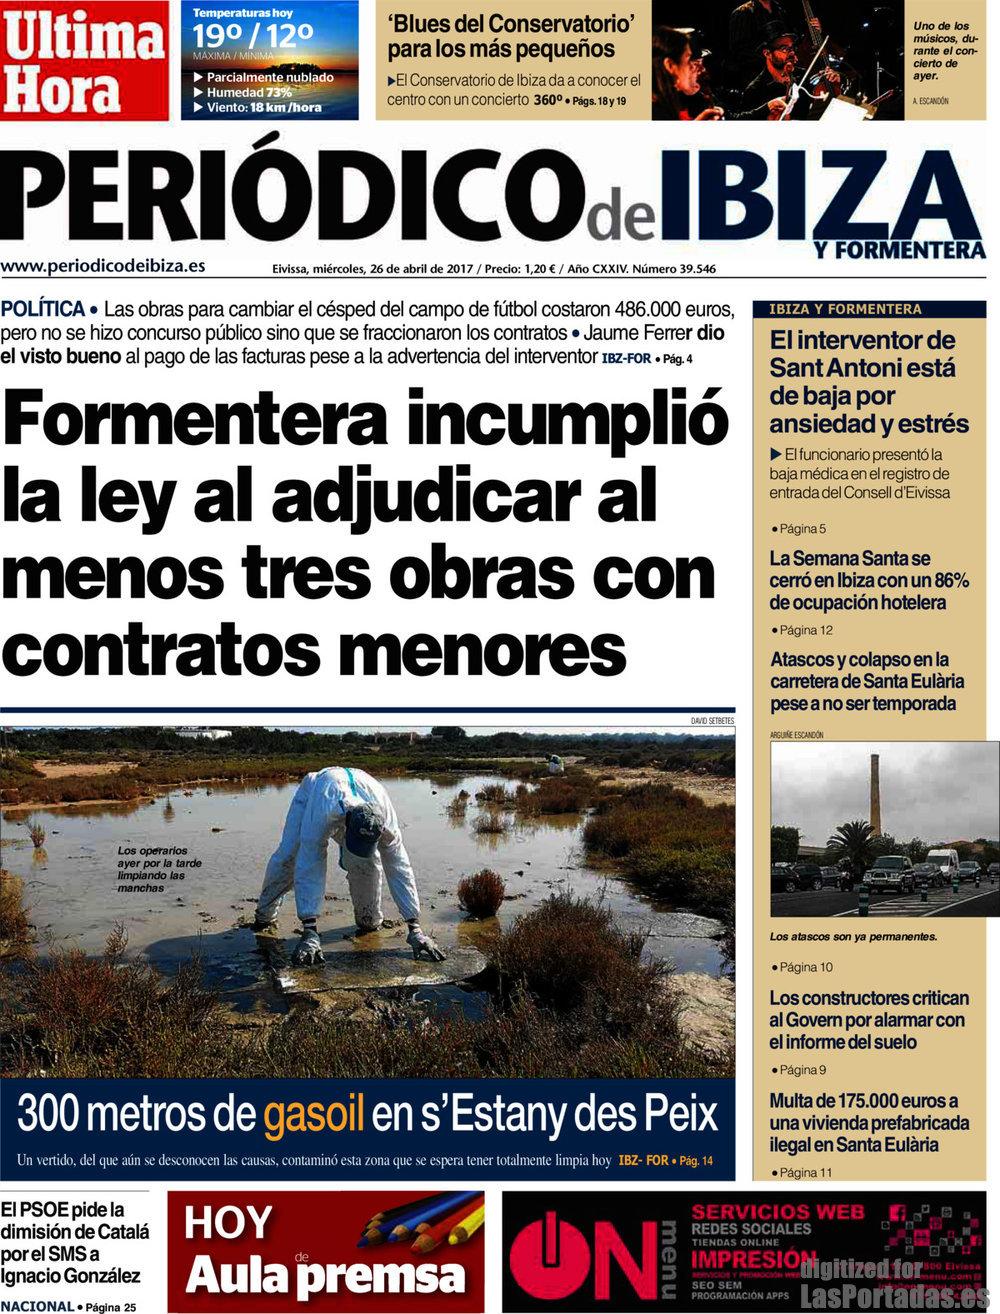 Periodico peri dico de ibiza 26 4 2017 - Conservatorio de ibiza ...